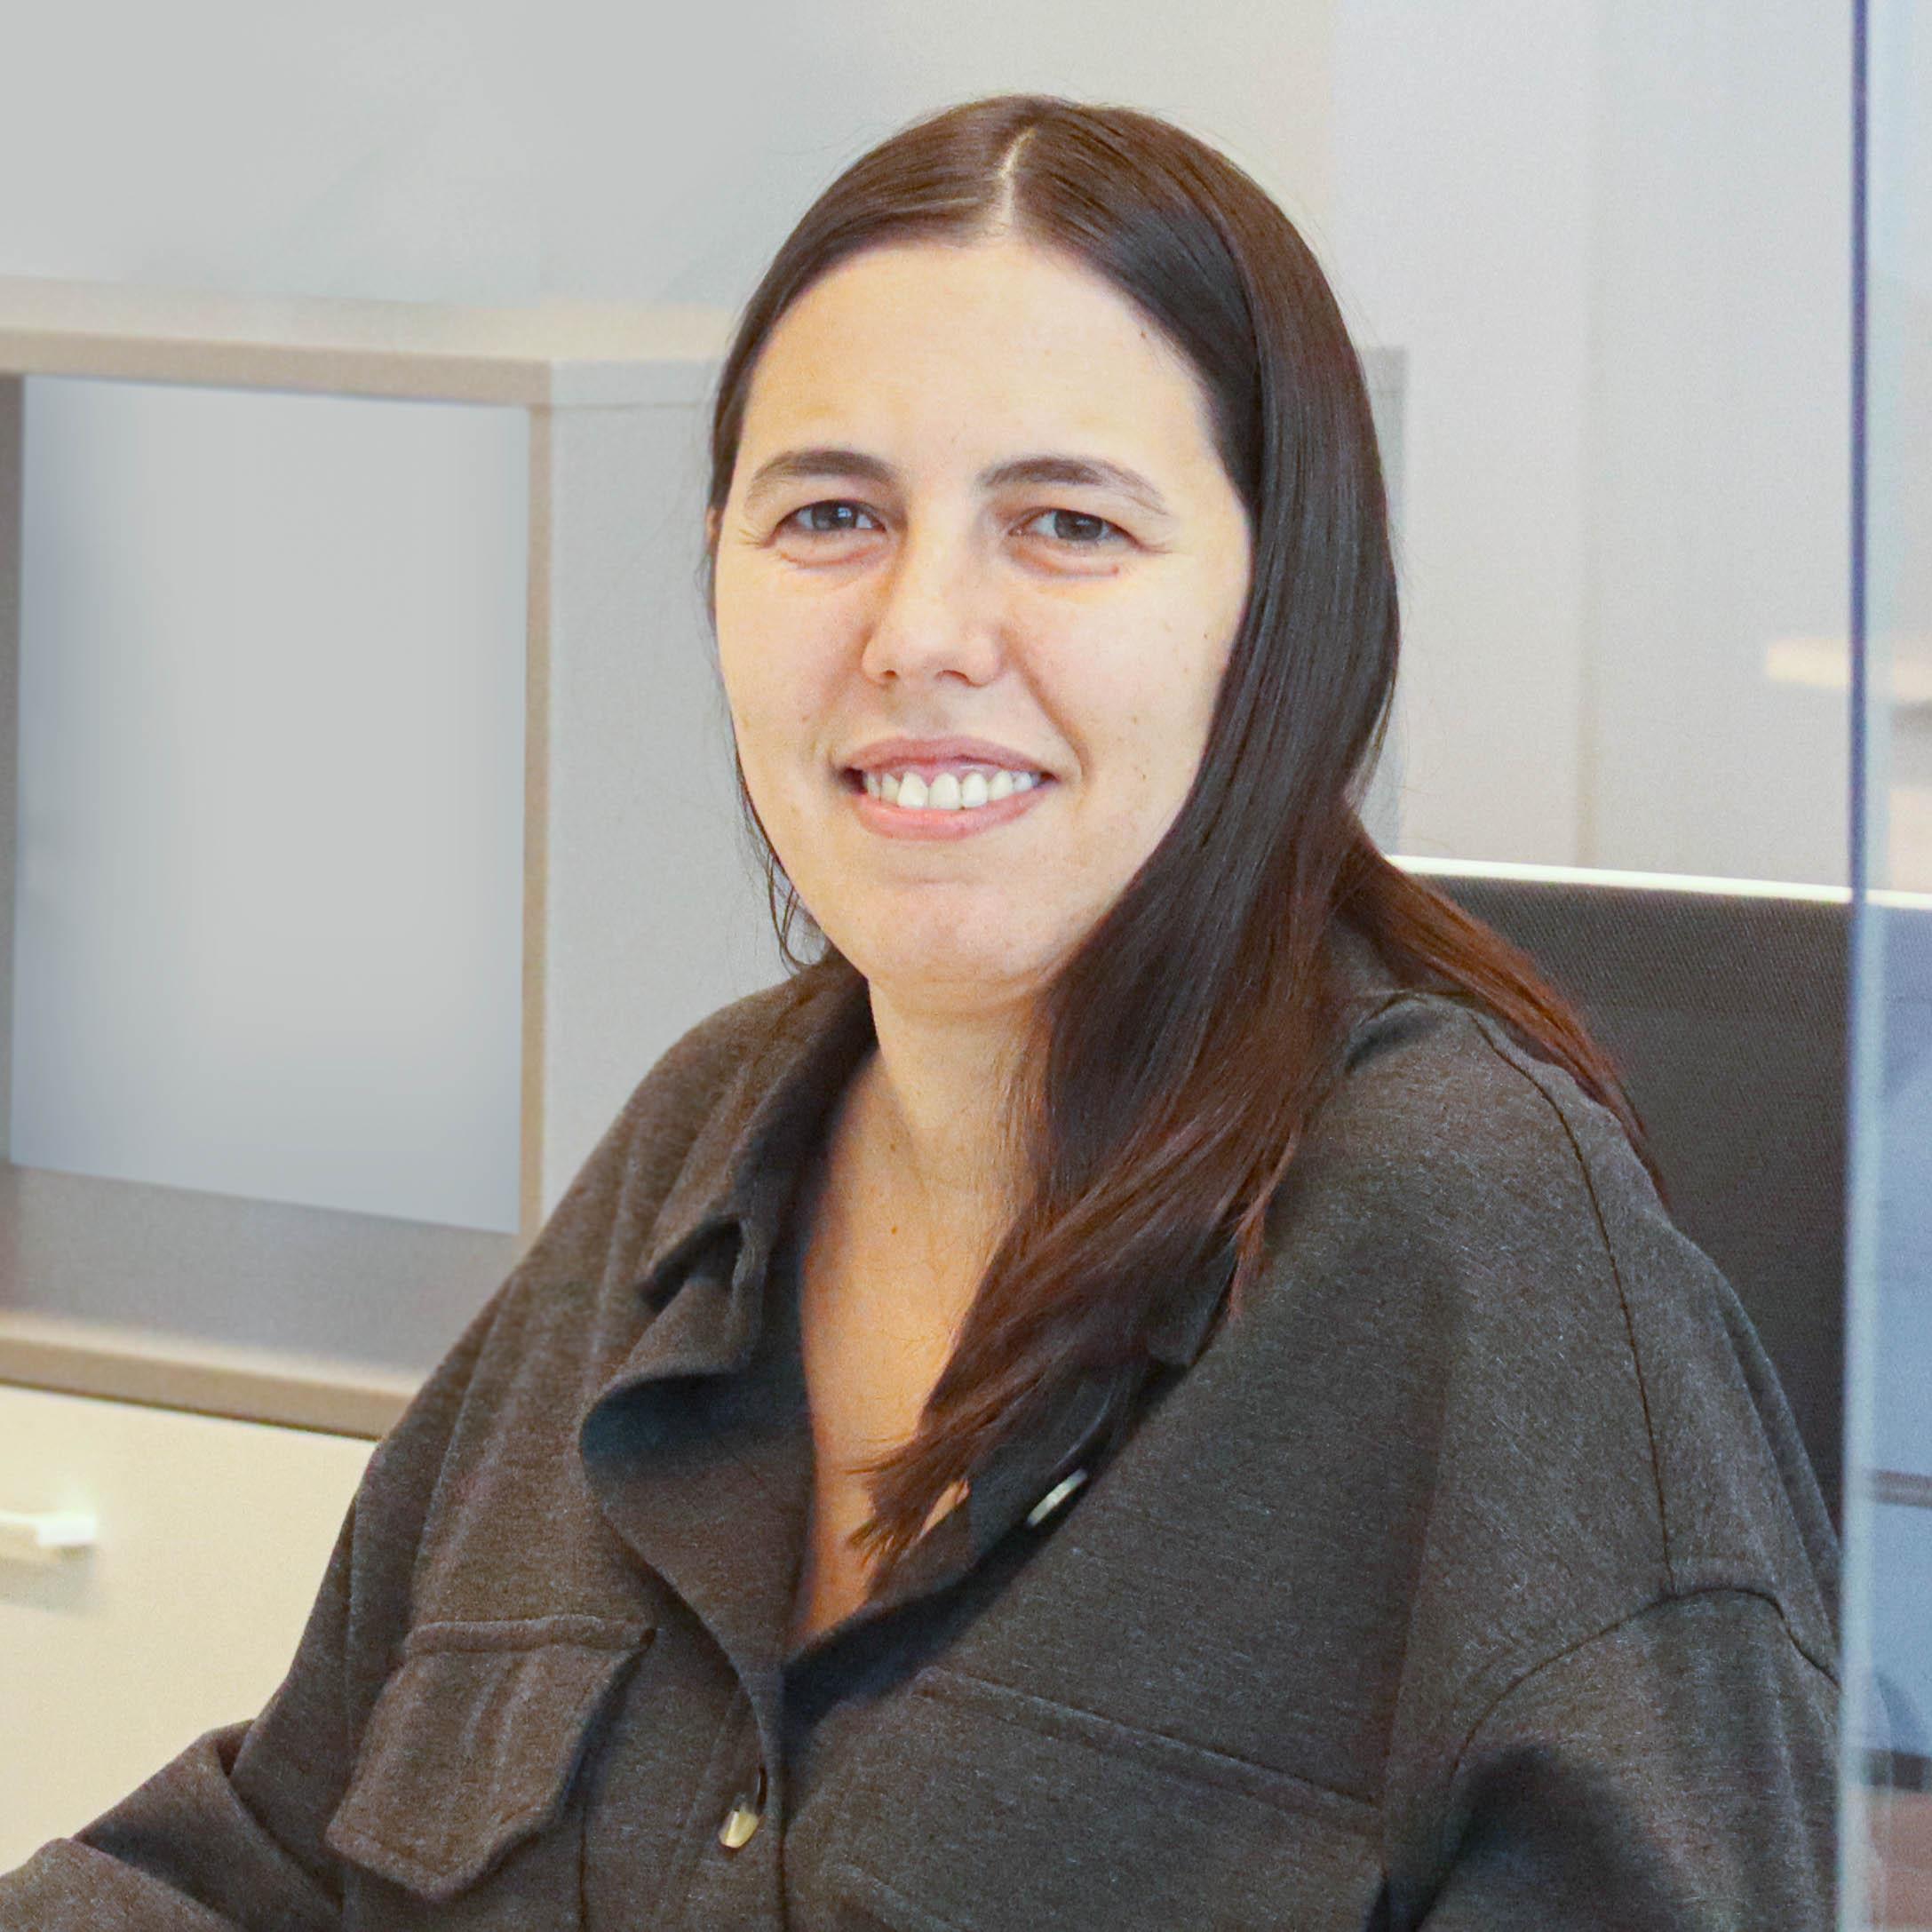 Patrizia Casiraghi